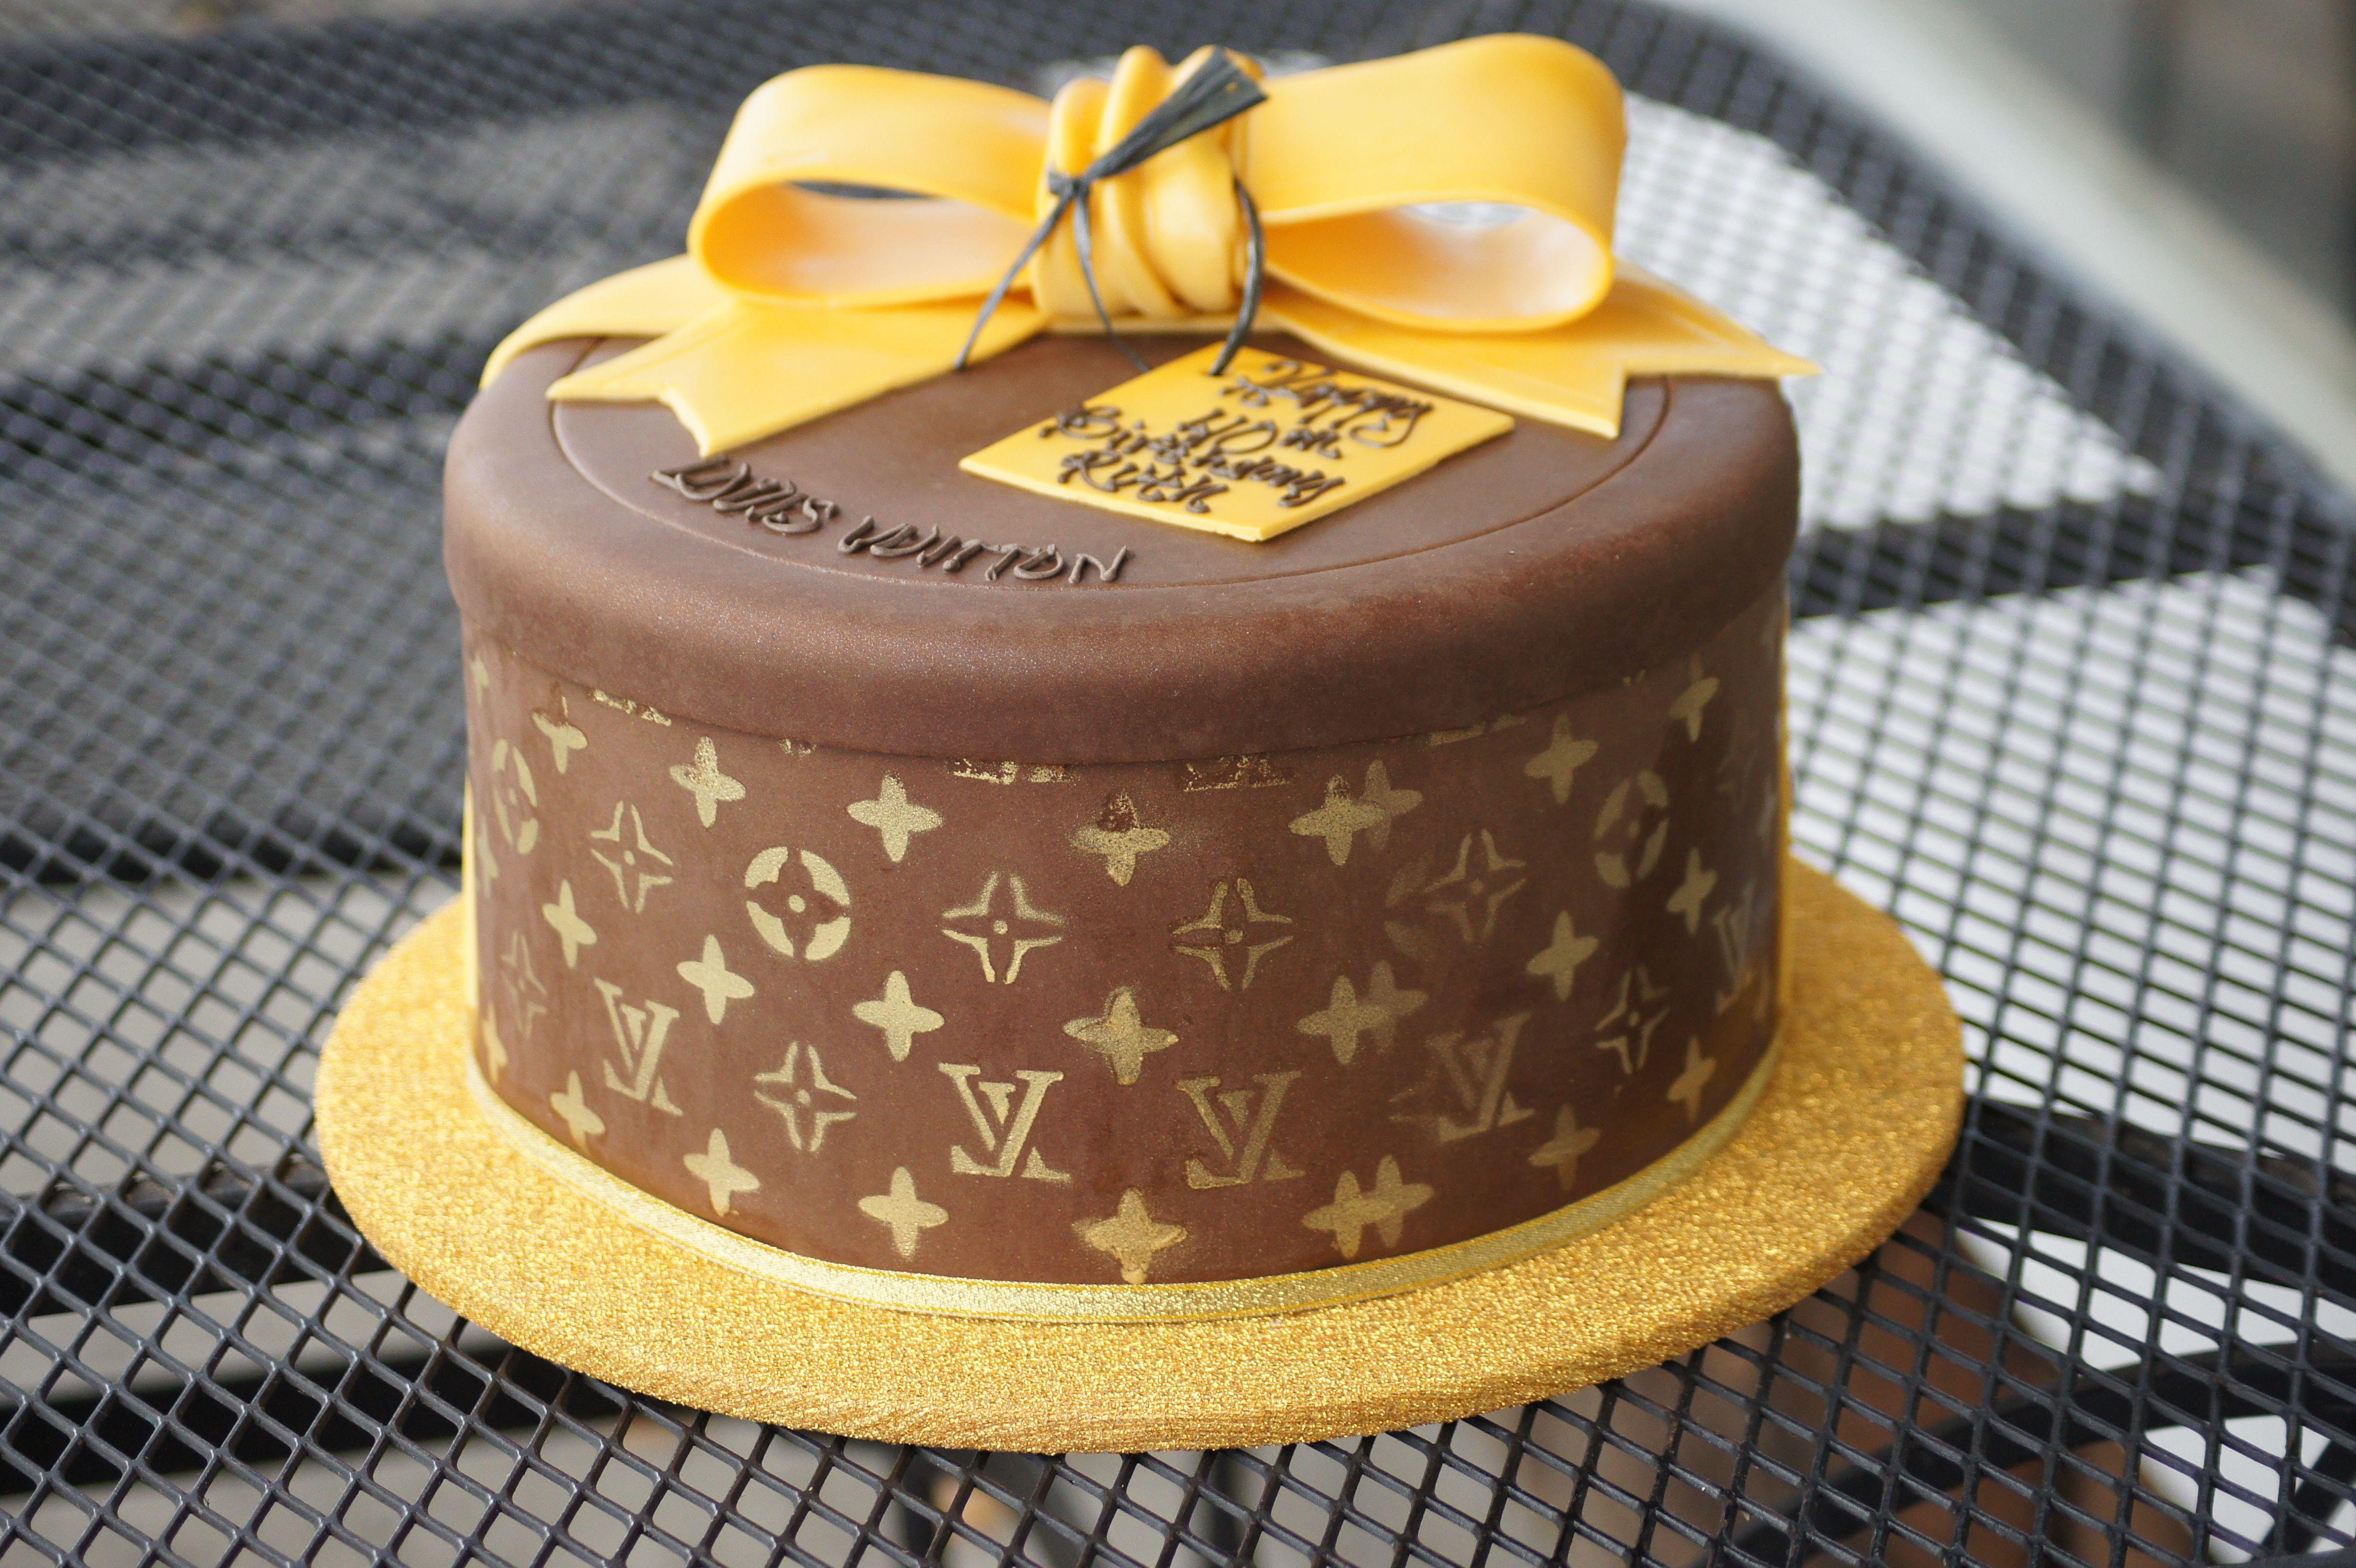 Louis Vuitton designer gift box birthday cake Themed